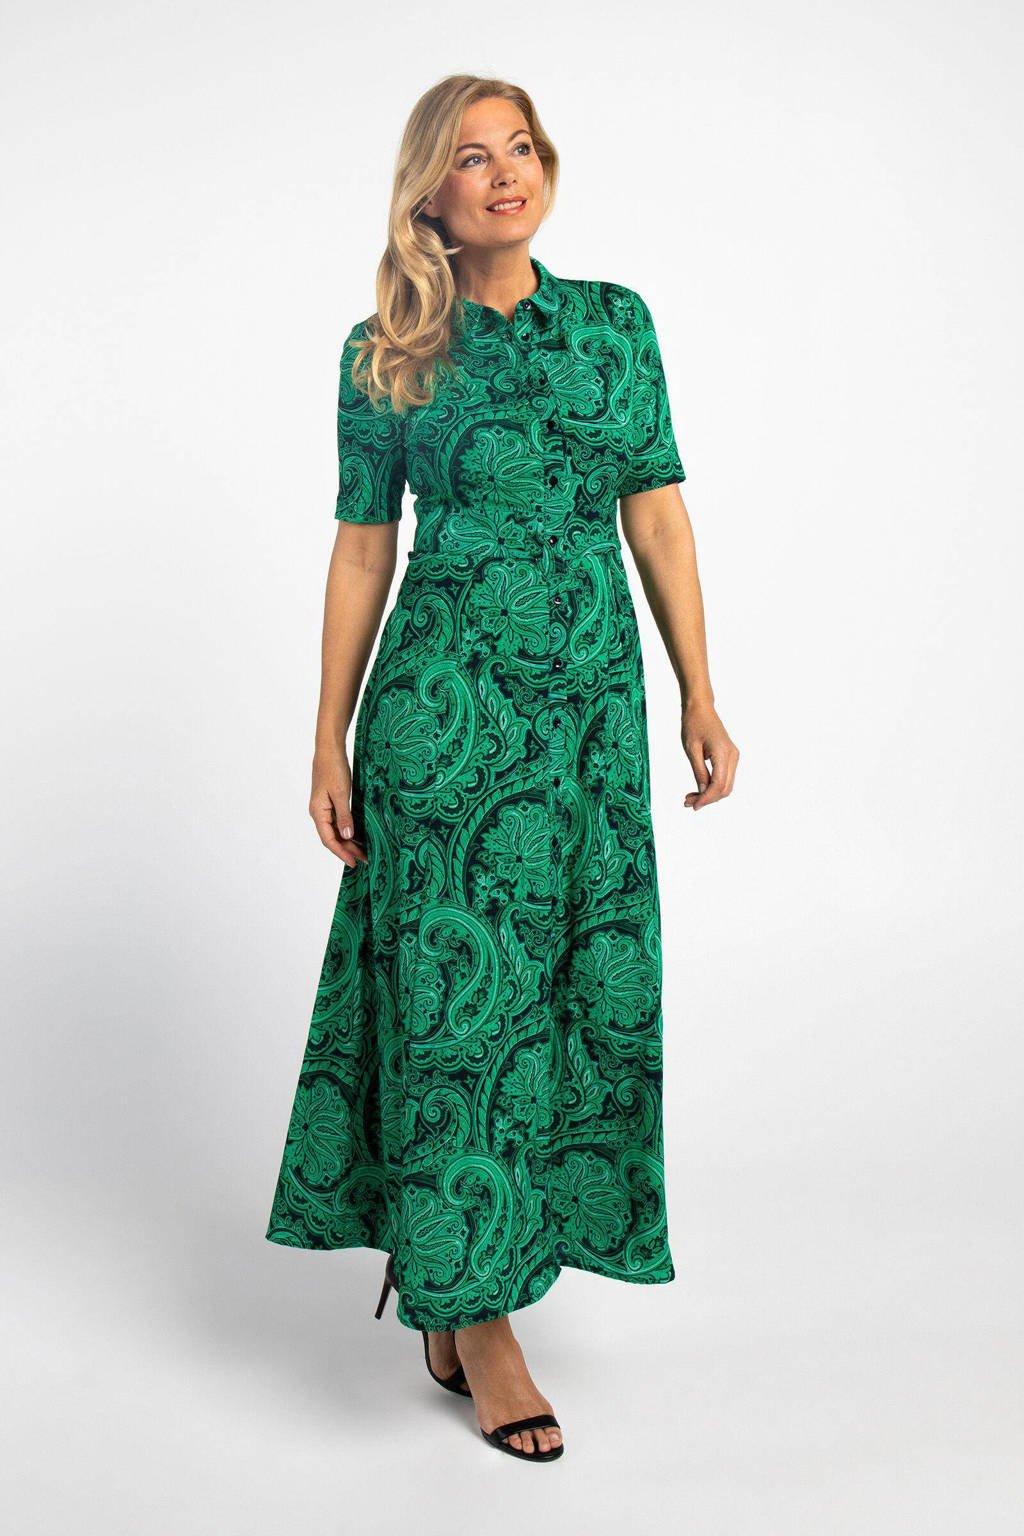 PROMISS blousejurk met paisleyprint groen, Groen